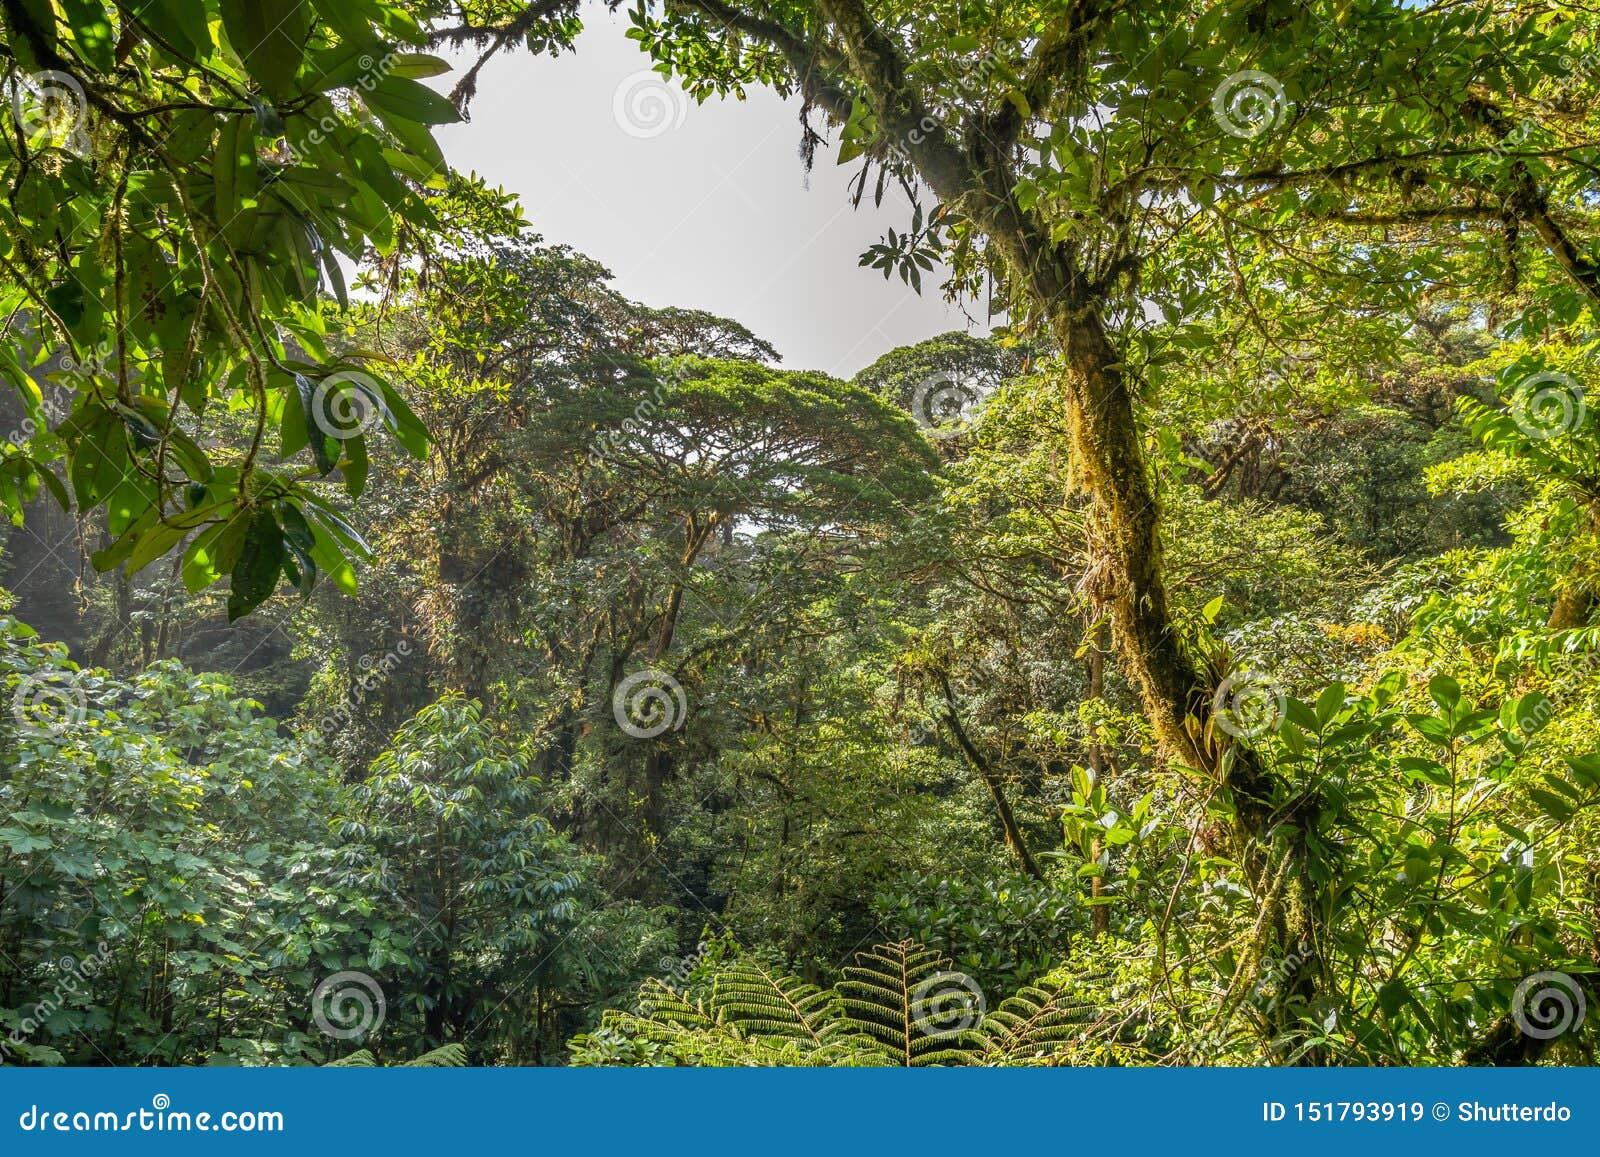 Dense jungle vegetation as seen from a canopy bridge